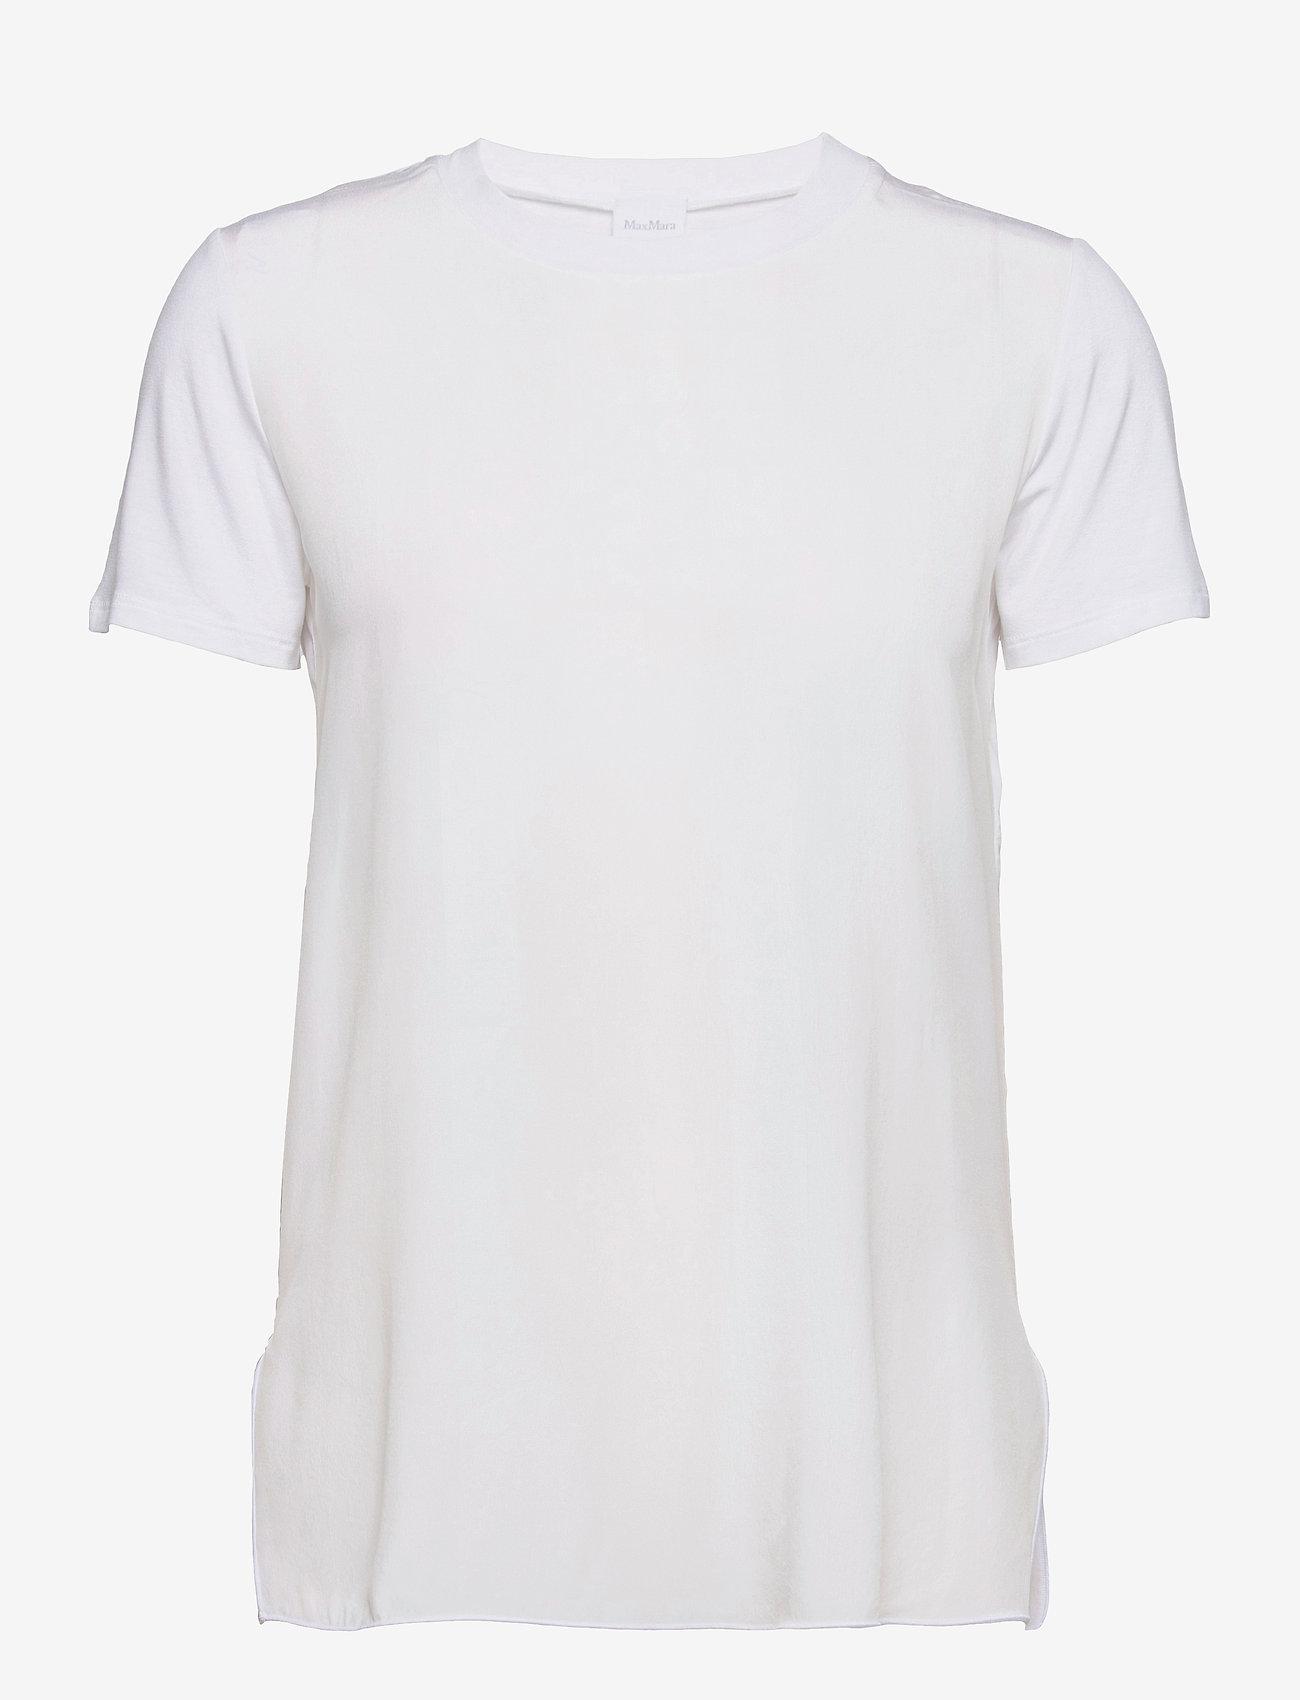 Max Mara Leisure - POSATO - t-shirts - optical white - 0